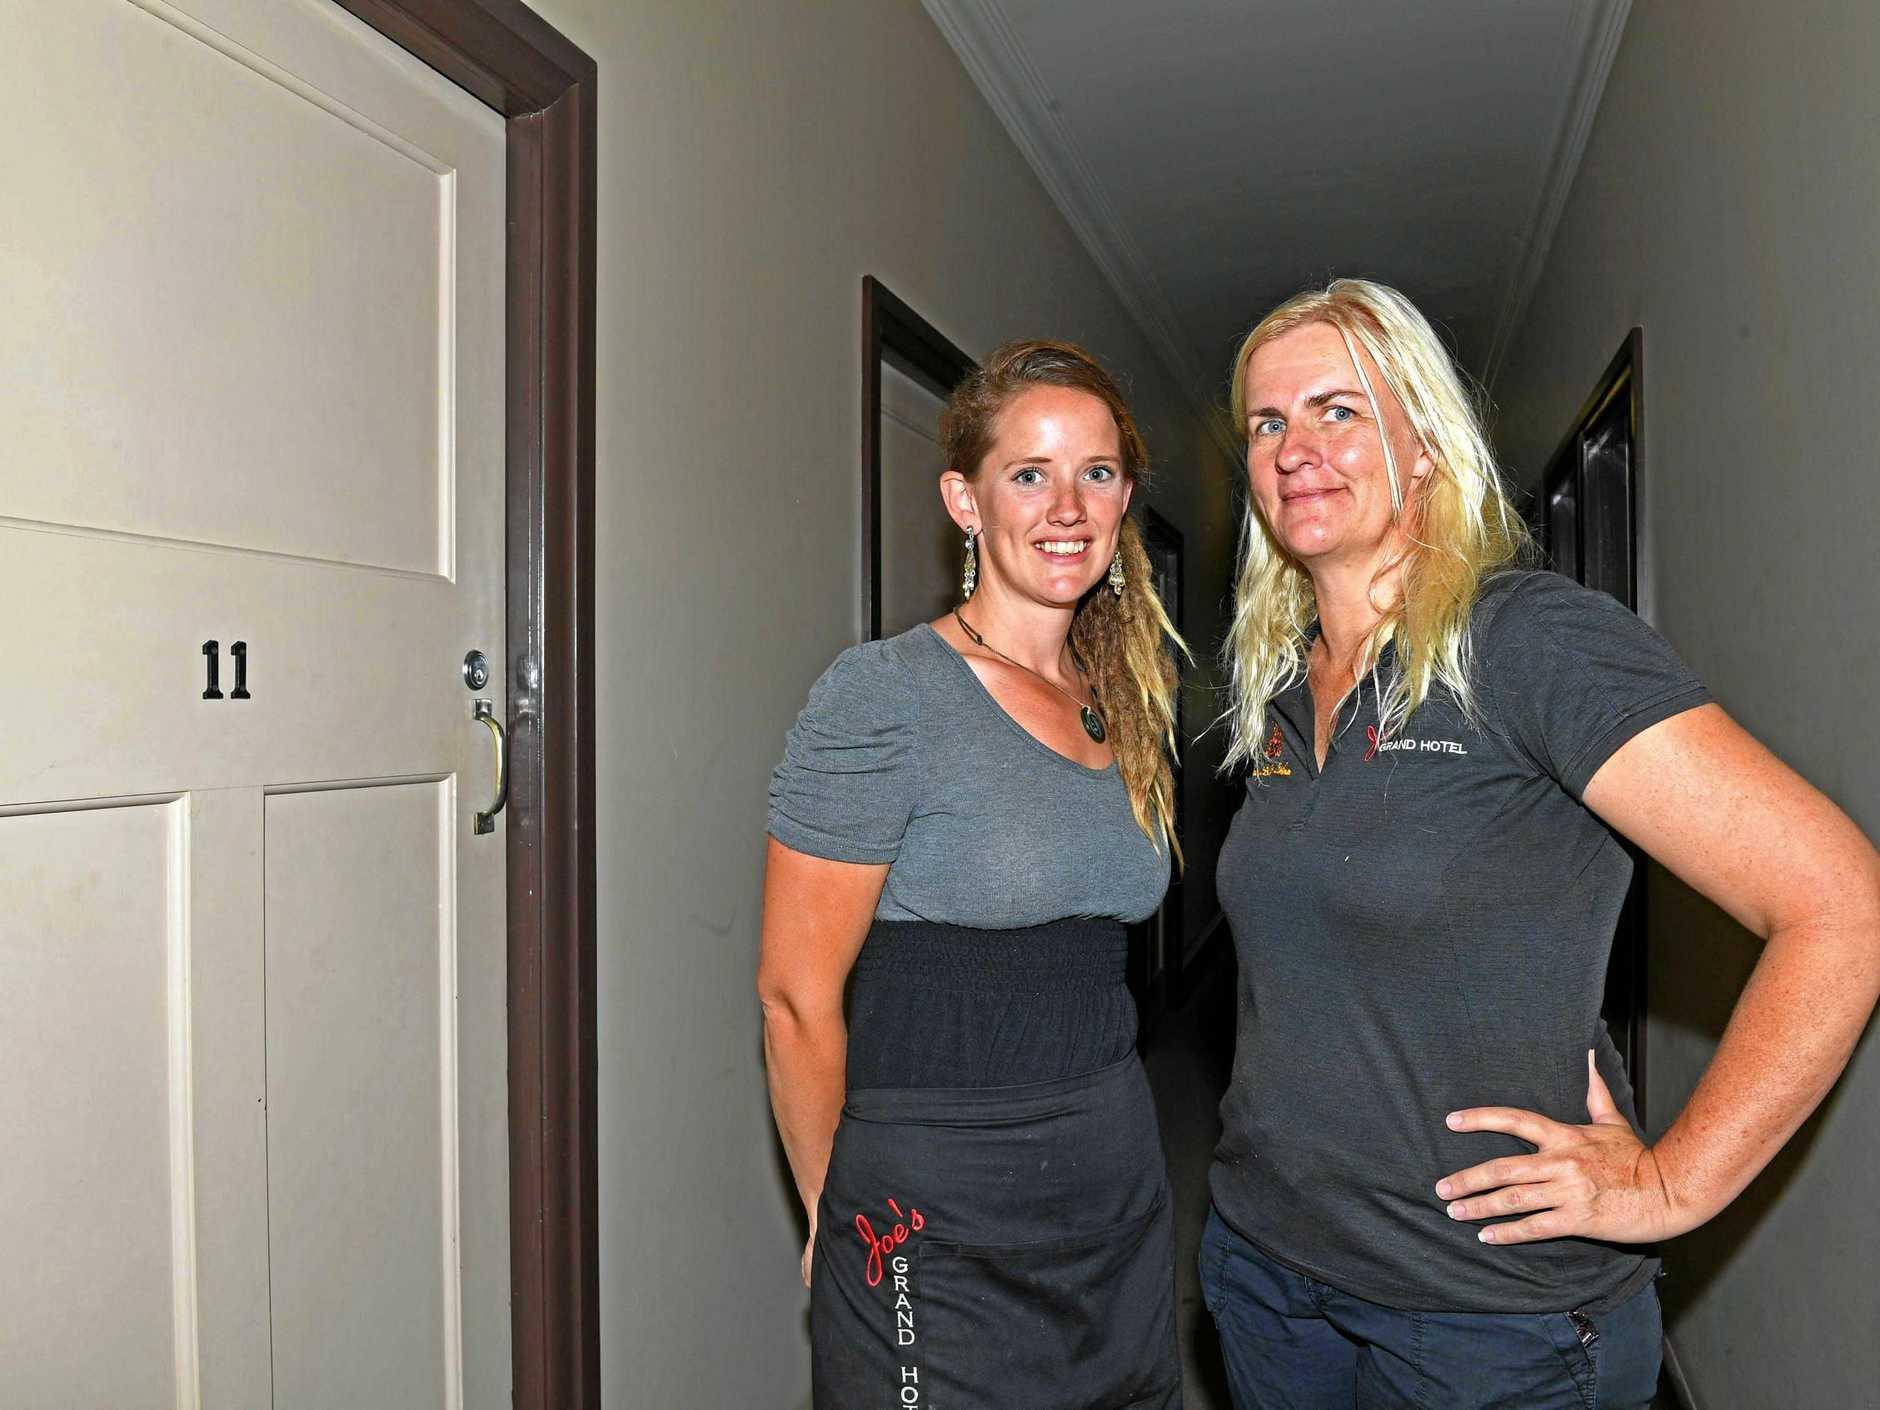 Emma Lucas and Sally Detlefson outside Room 11 of Joe's Grand Hotel in Goomeri.